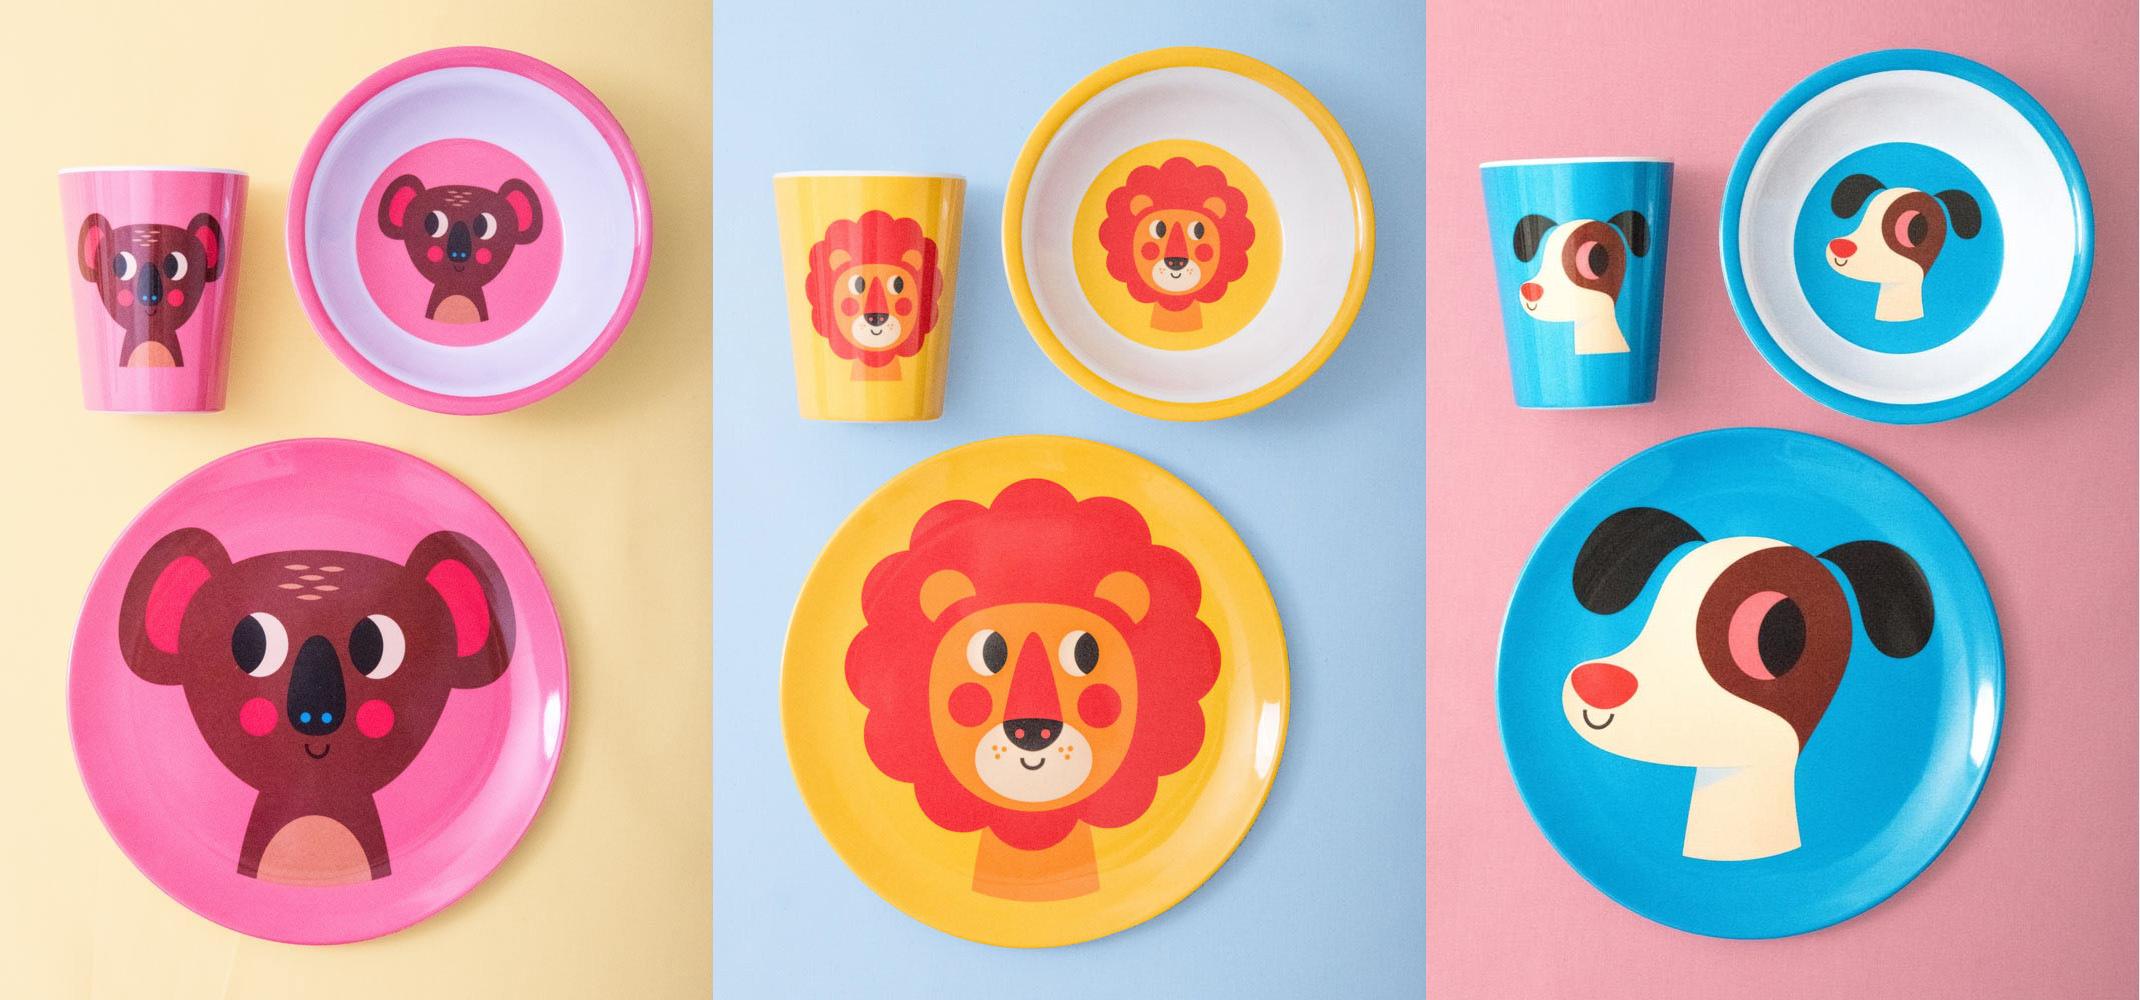 ingela-koala-plate-bowl-cup拷貝